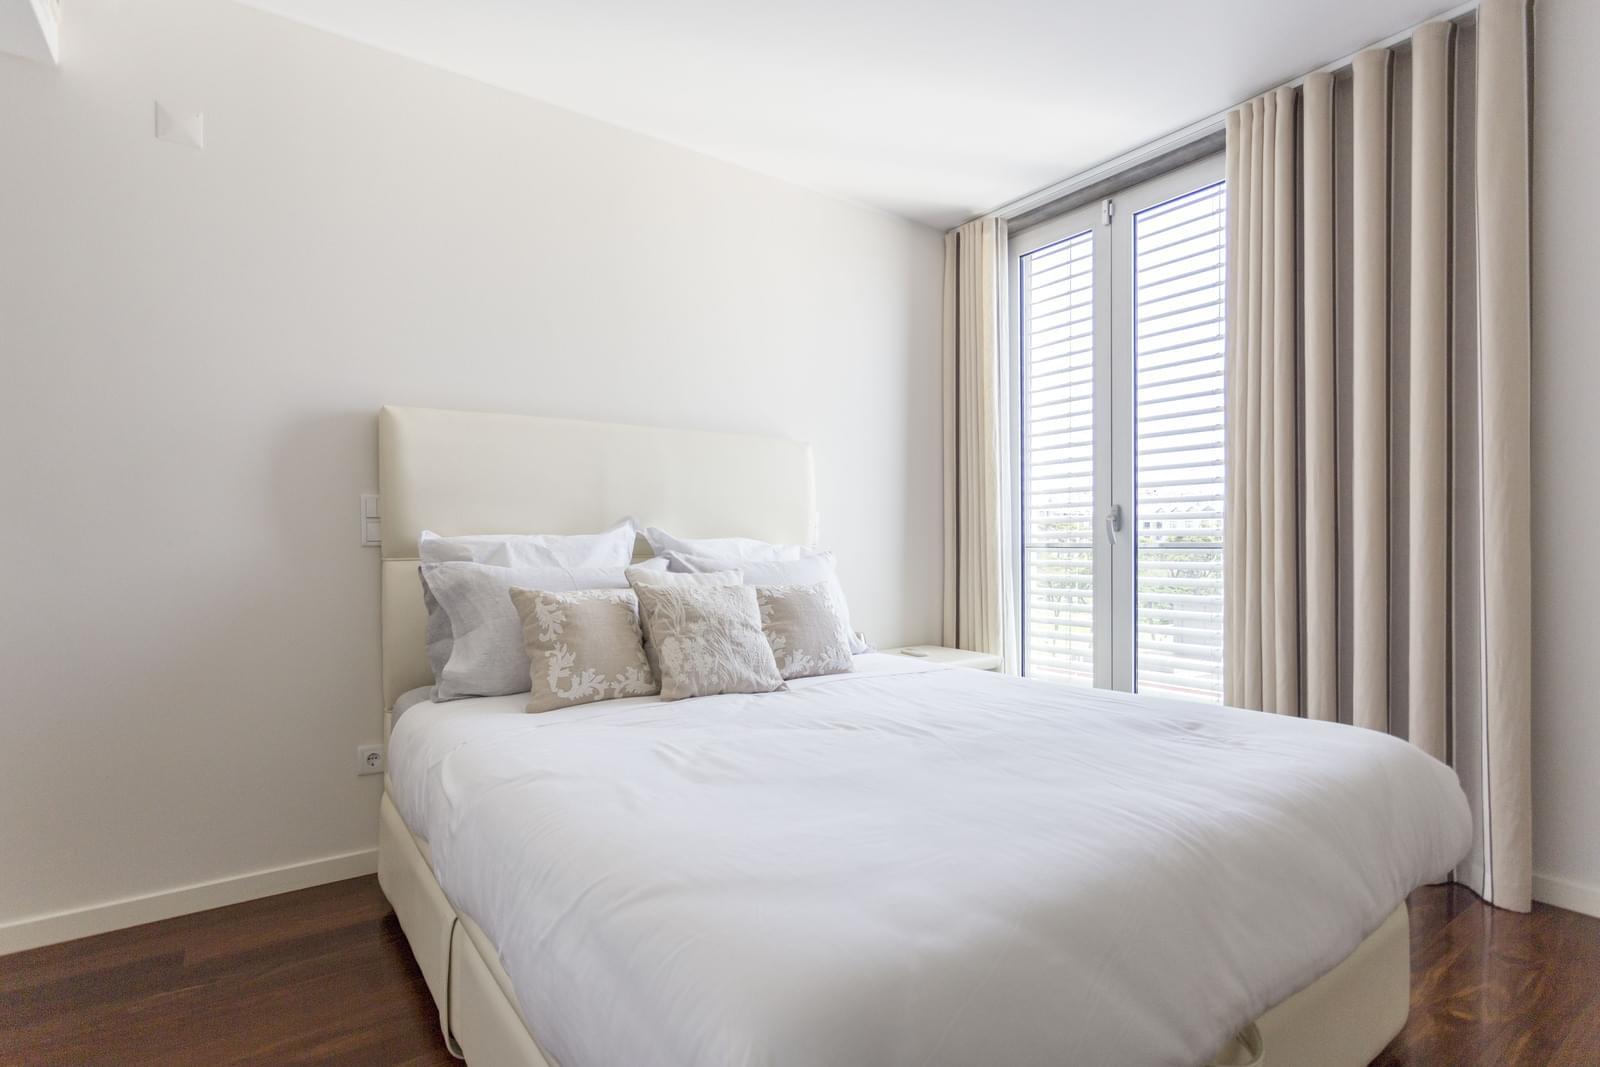 pf17631-apartamento-t5-cascais-572a2dfc-8382-4048-8701-74ae13cfc4c0